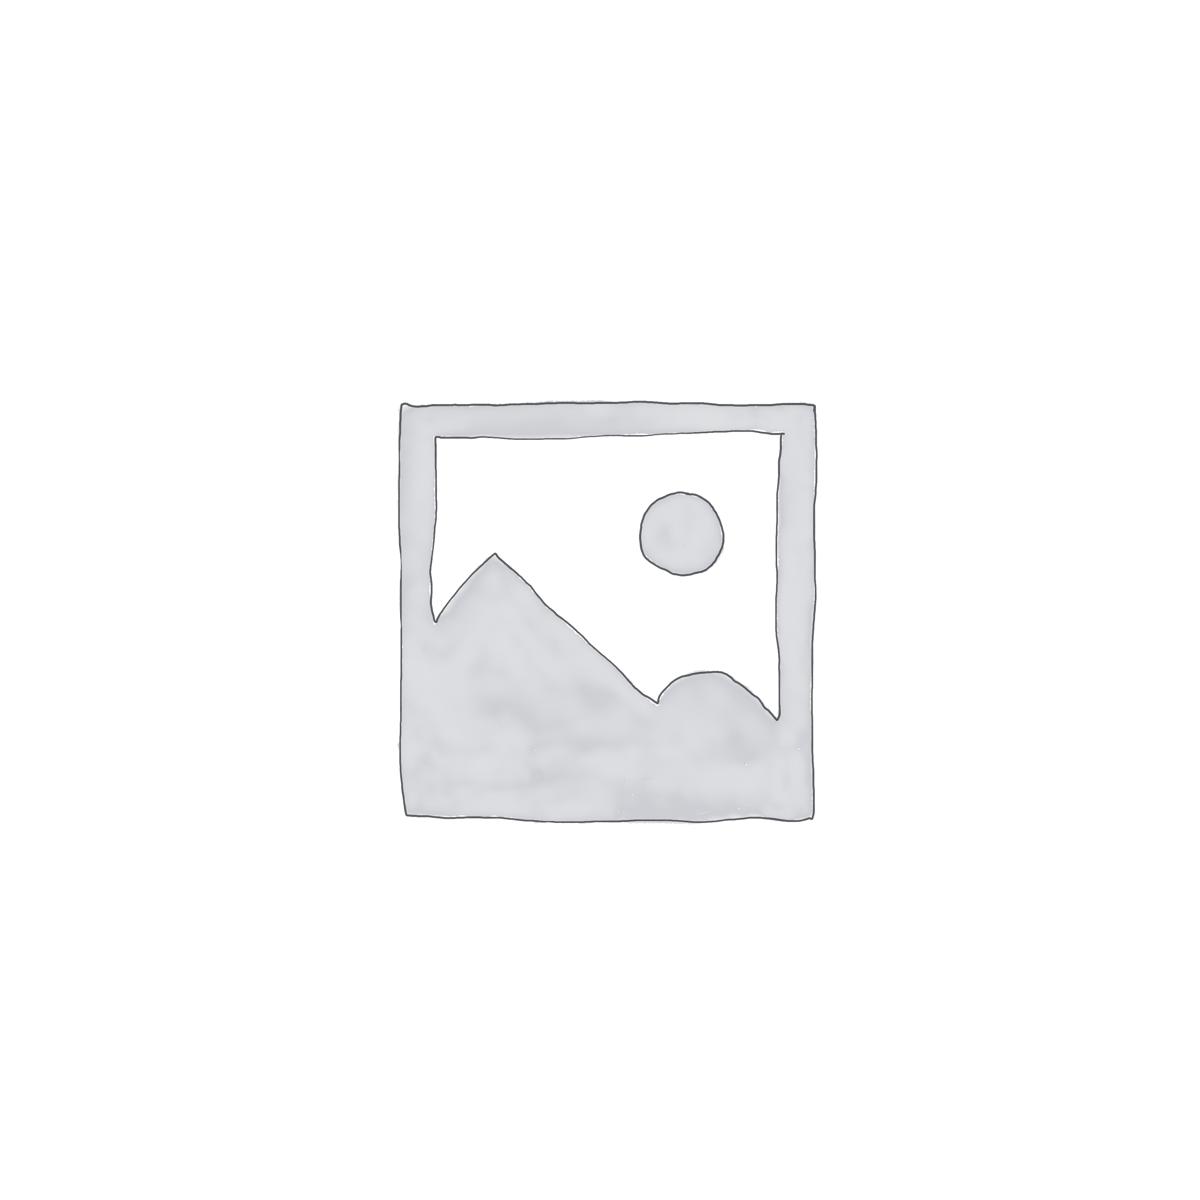 Blue Marble With Red Splash Wallpaper Mural Wallpaper Wallmur